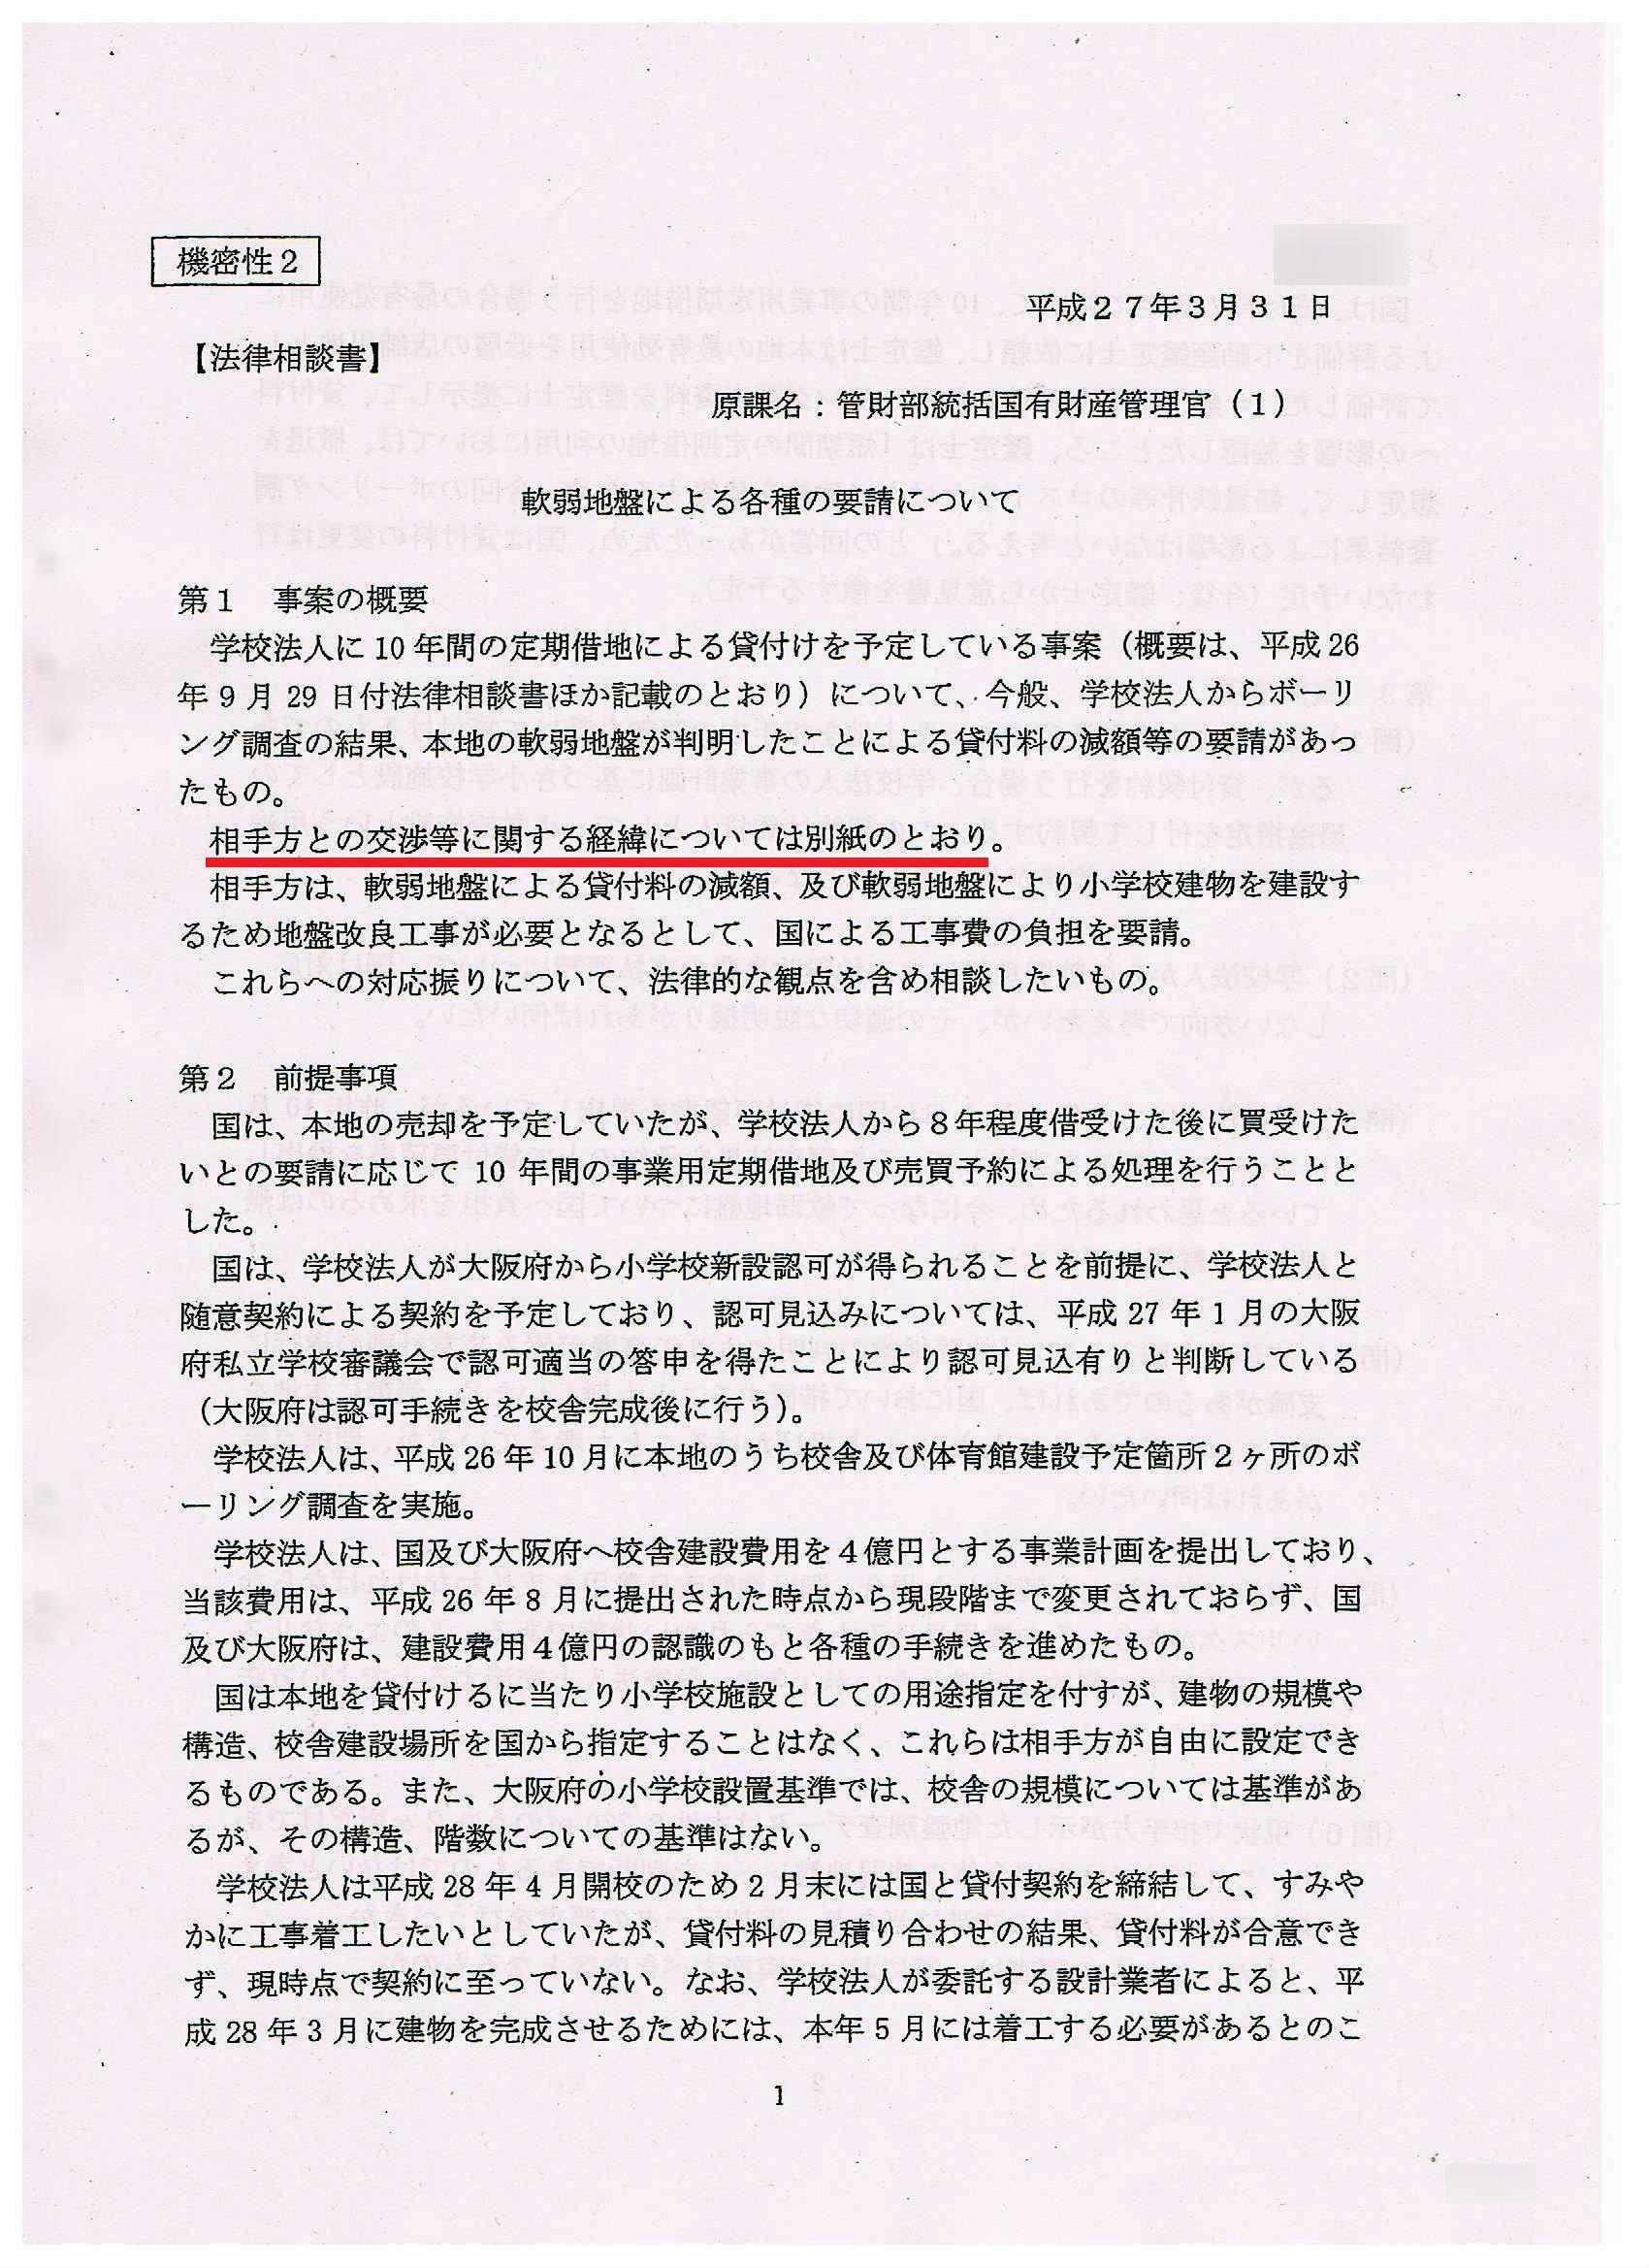 http://hunter-investigate.jp/news/3ef9844fecee7fbdf6f4f03567e71c765df269b9.jpg